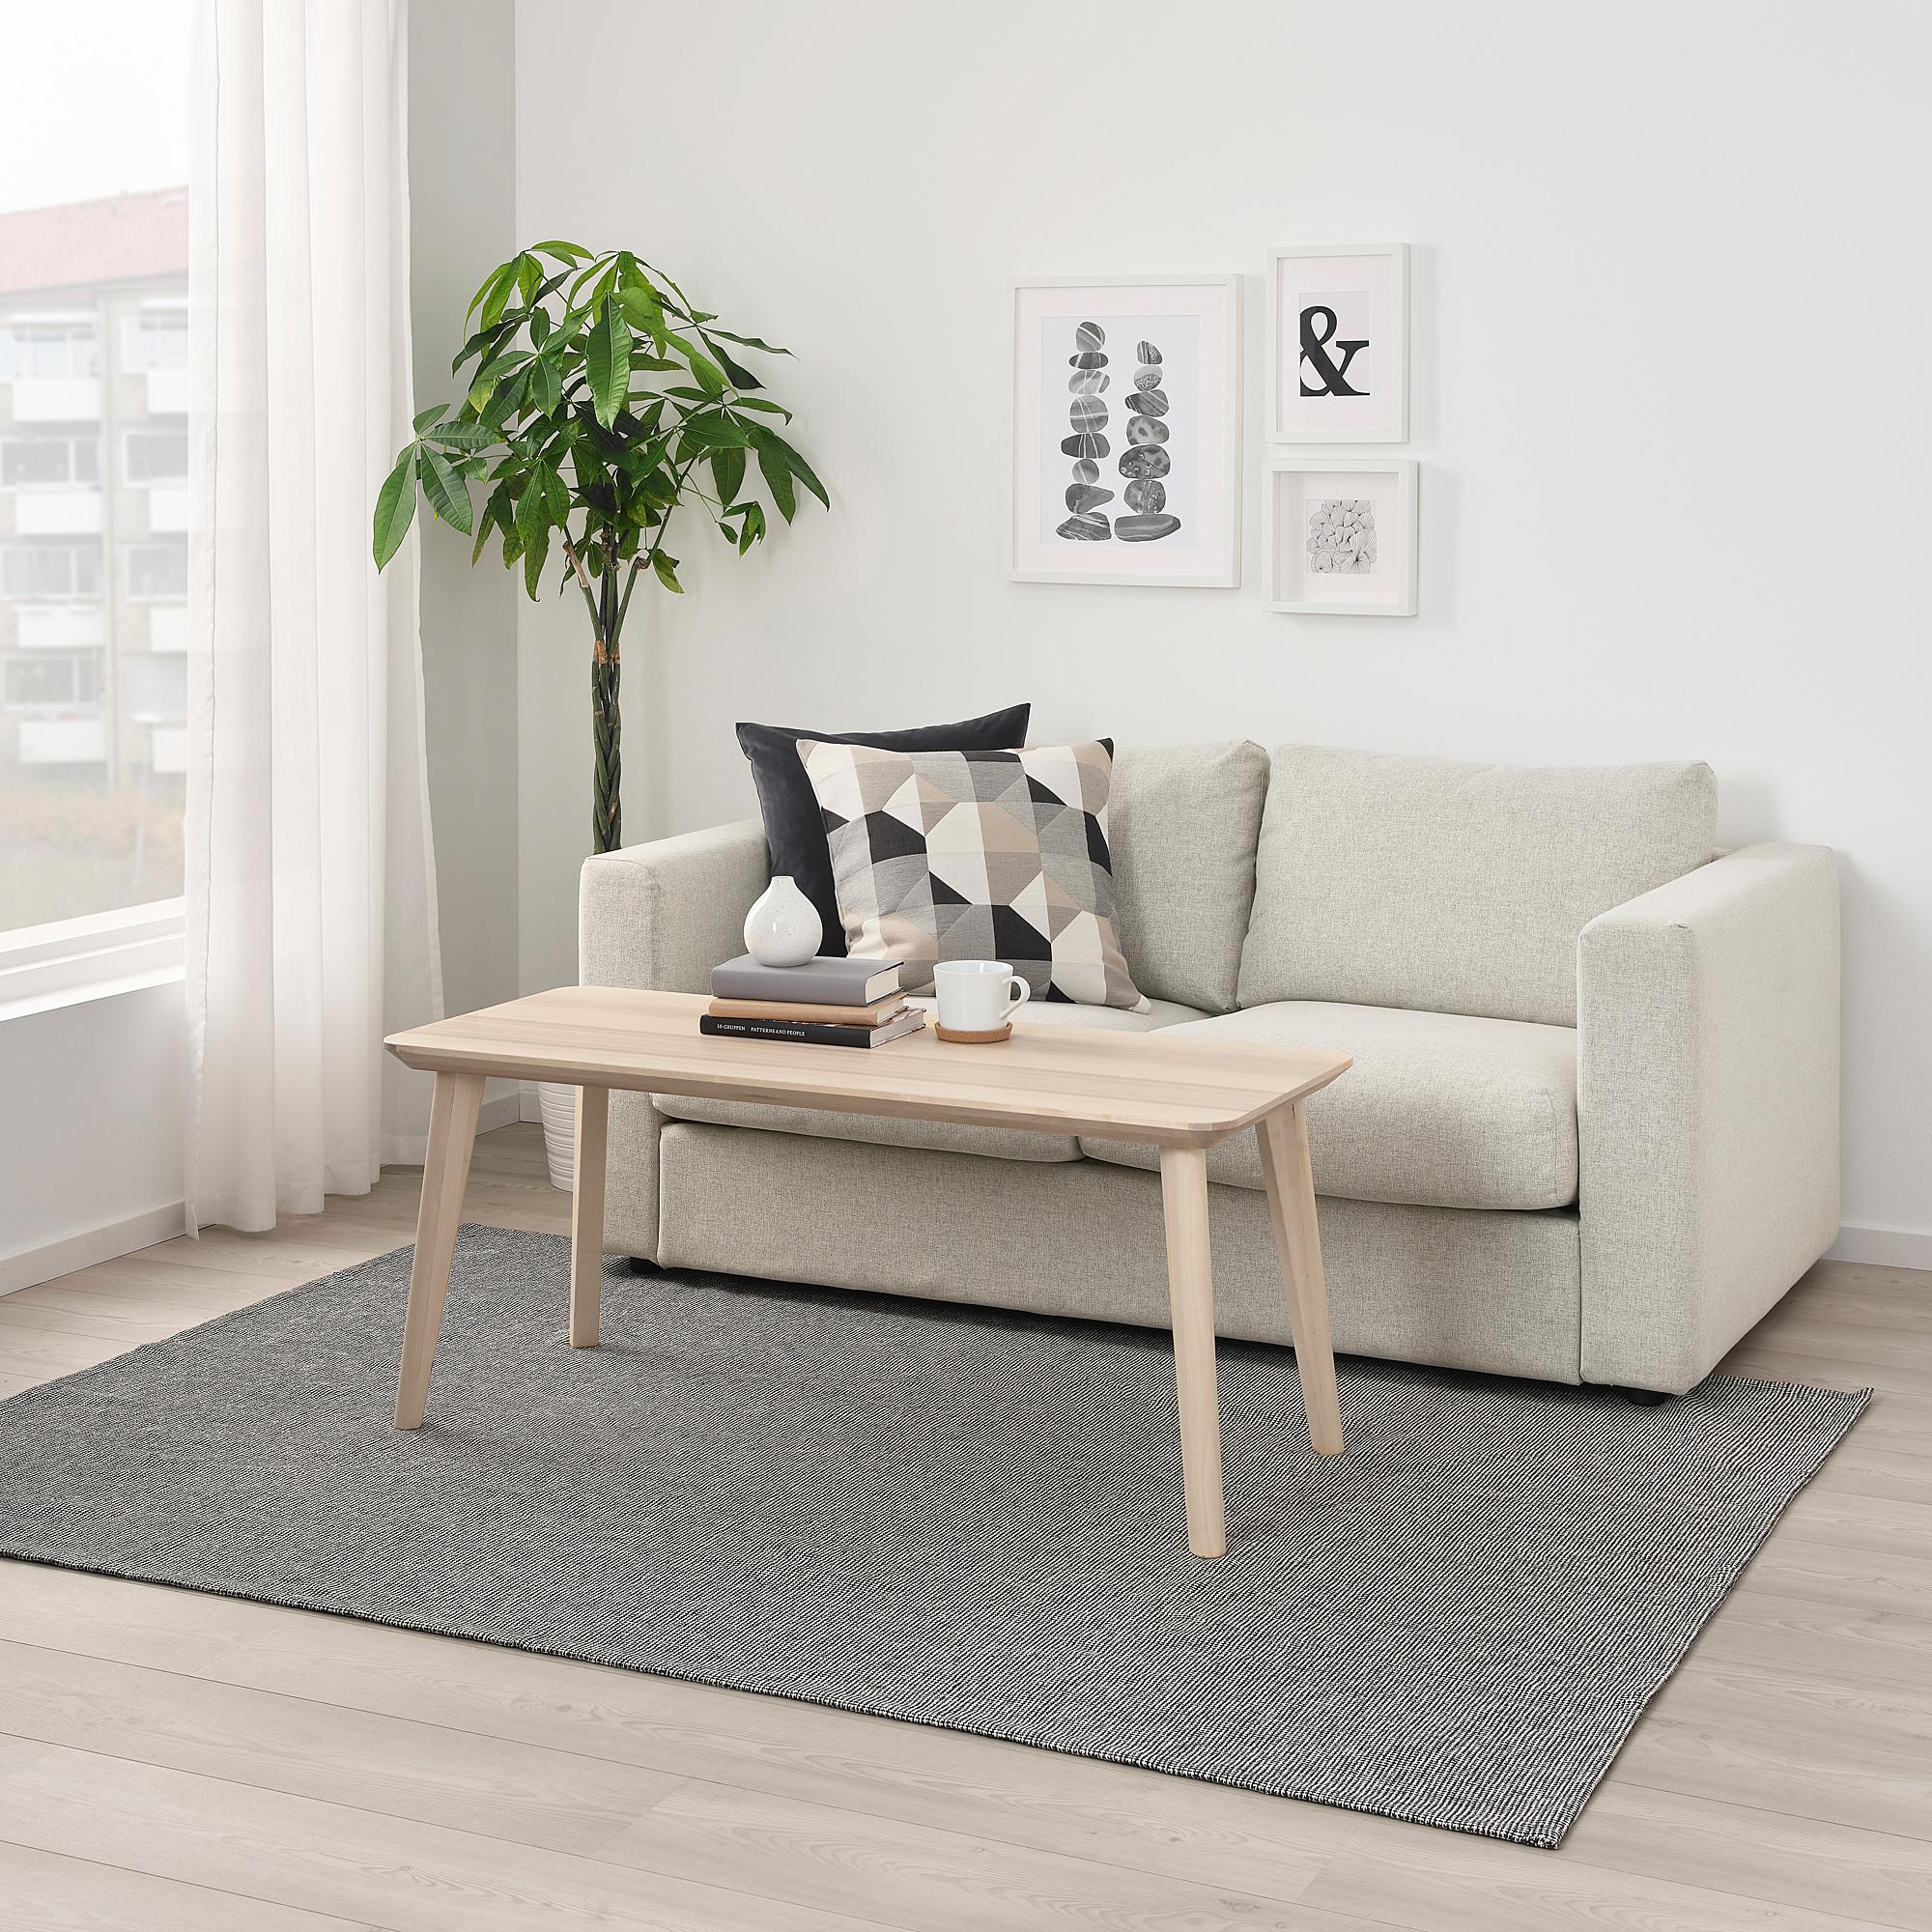 TIPHEDE rug, flatwoven